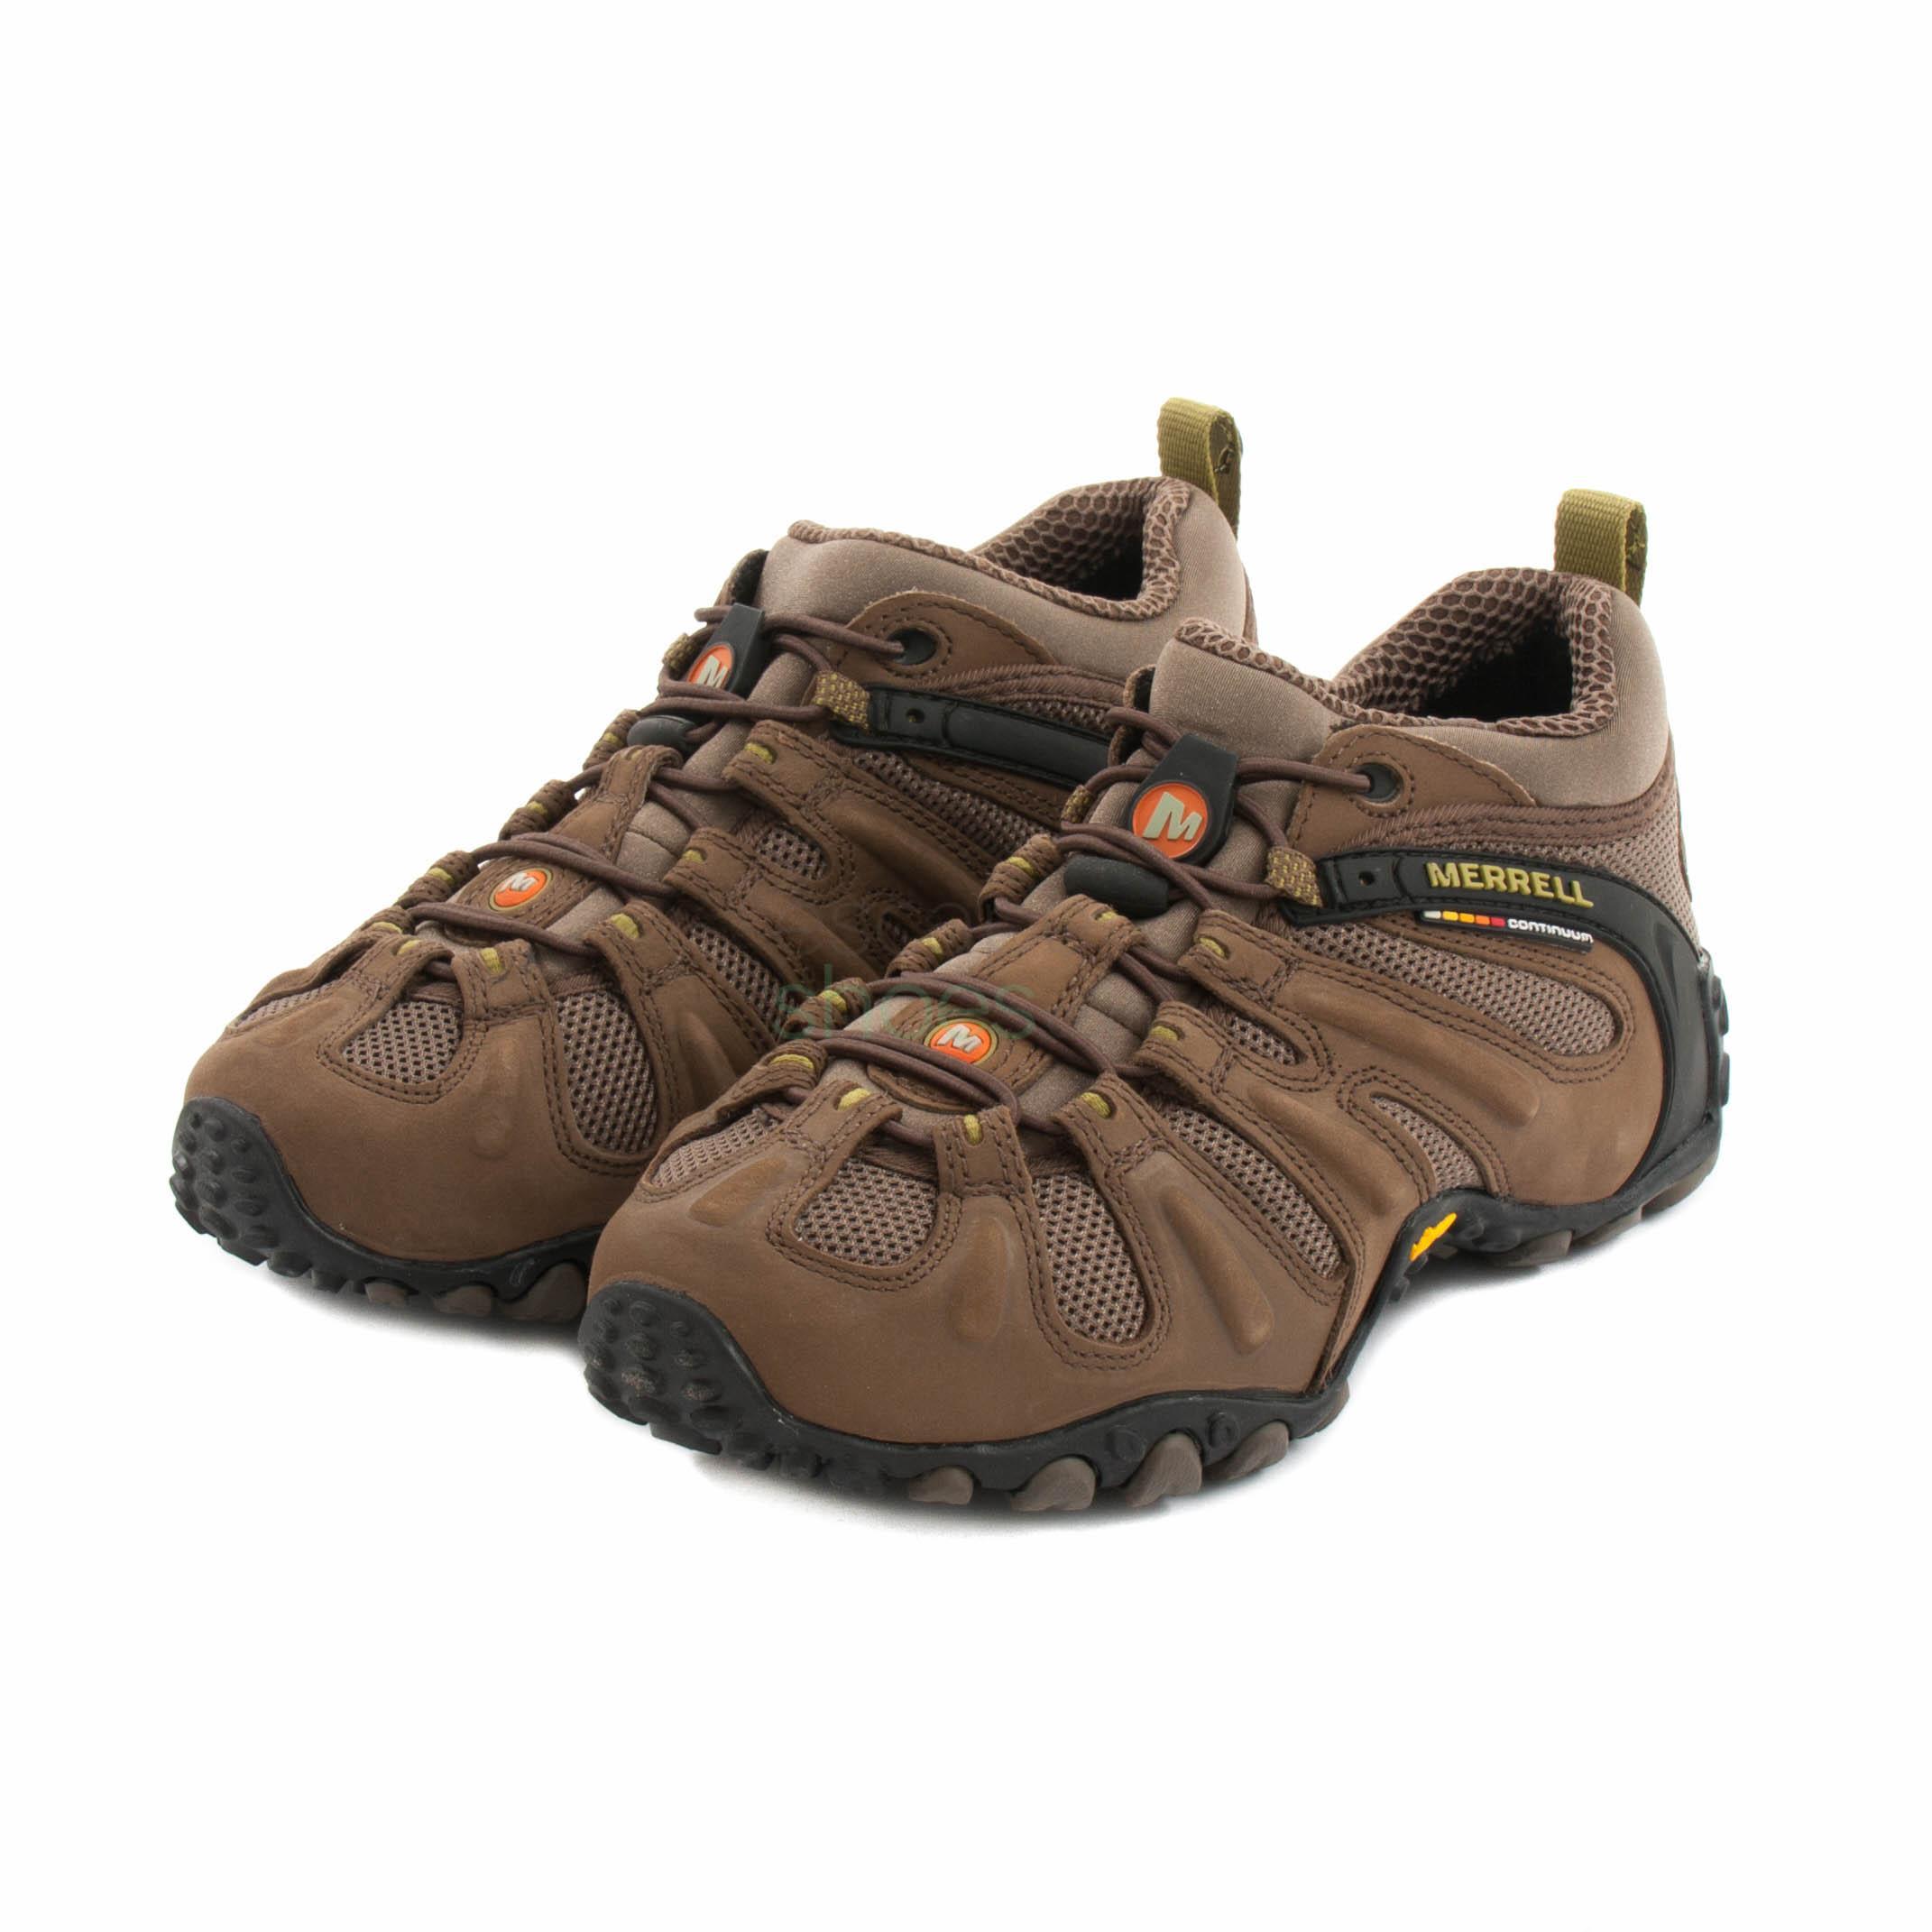 702b46de75b Your Sneakers Merrell J524100 Chameleon Ii Stretch Canteen